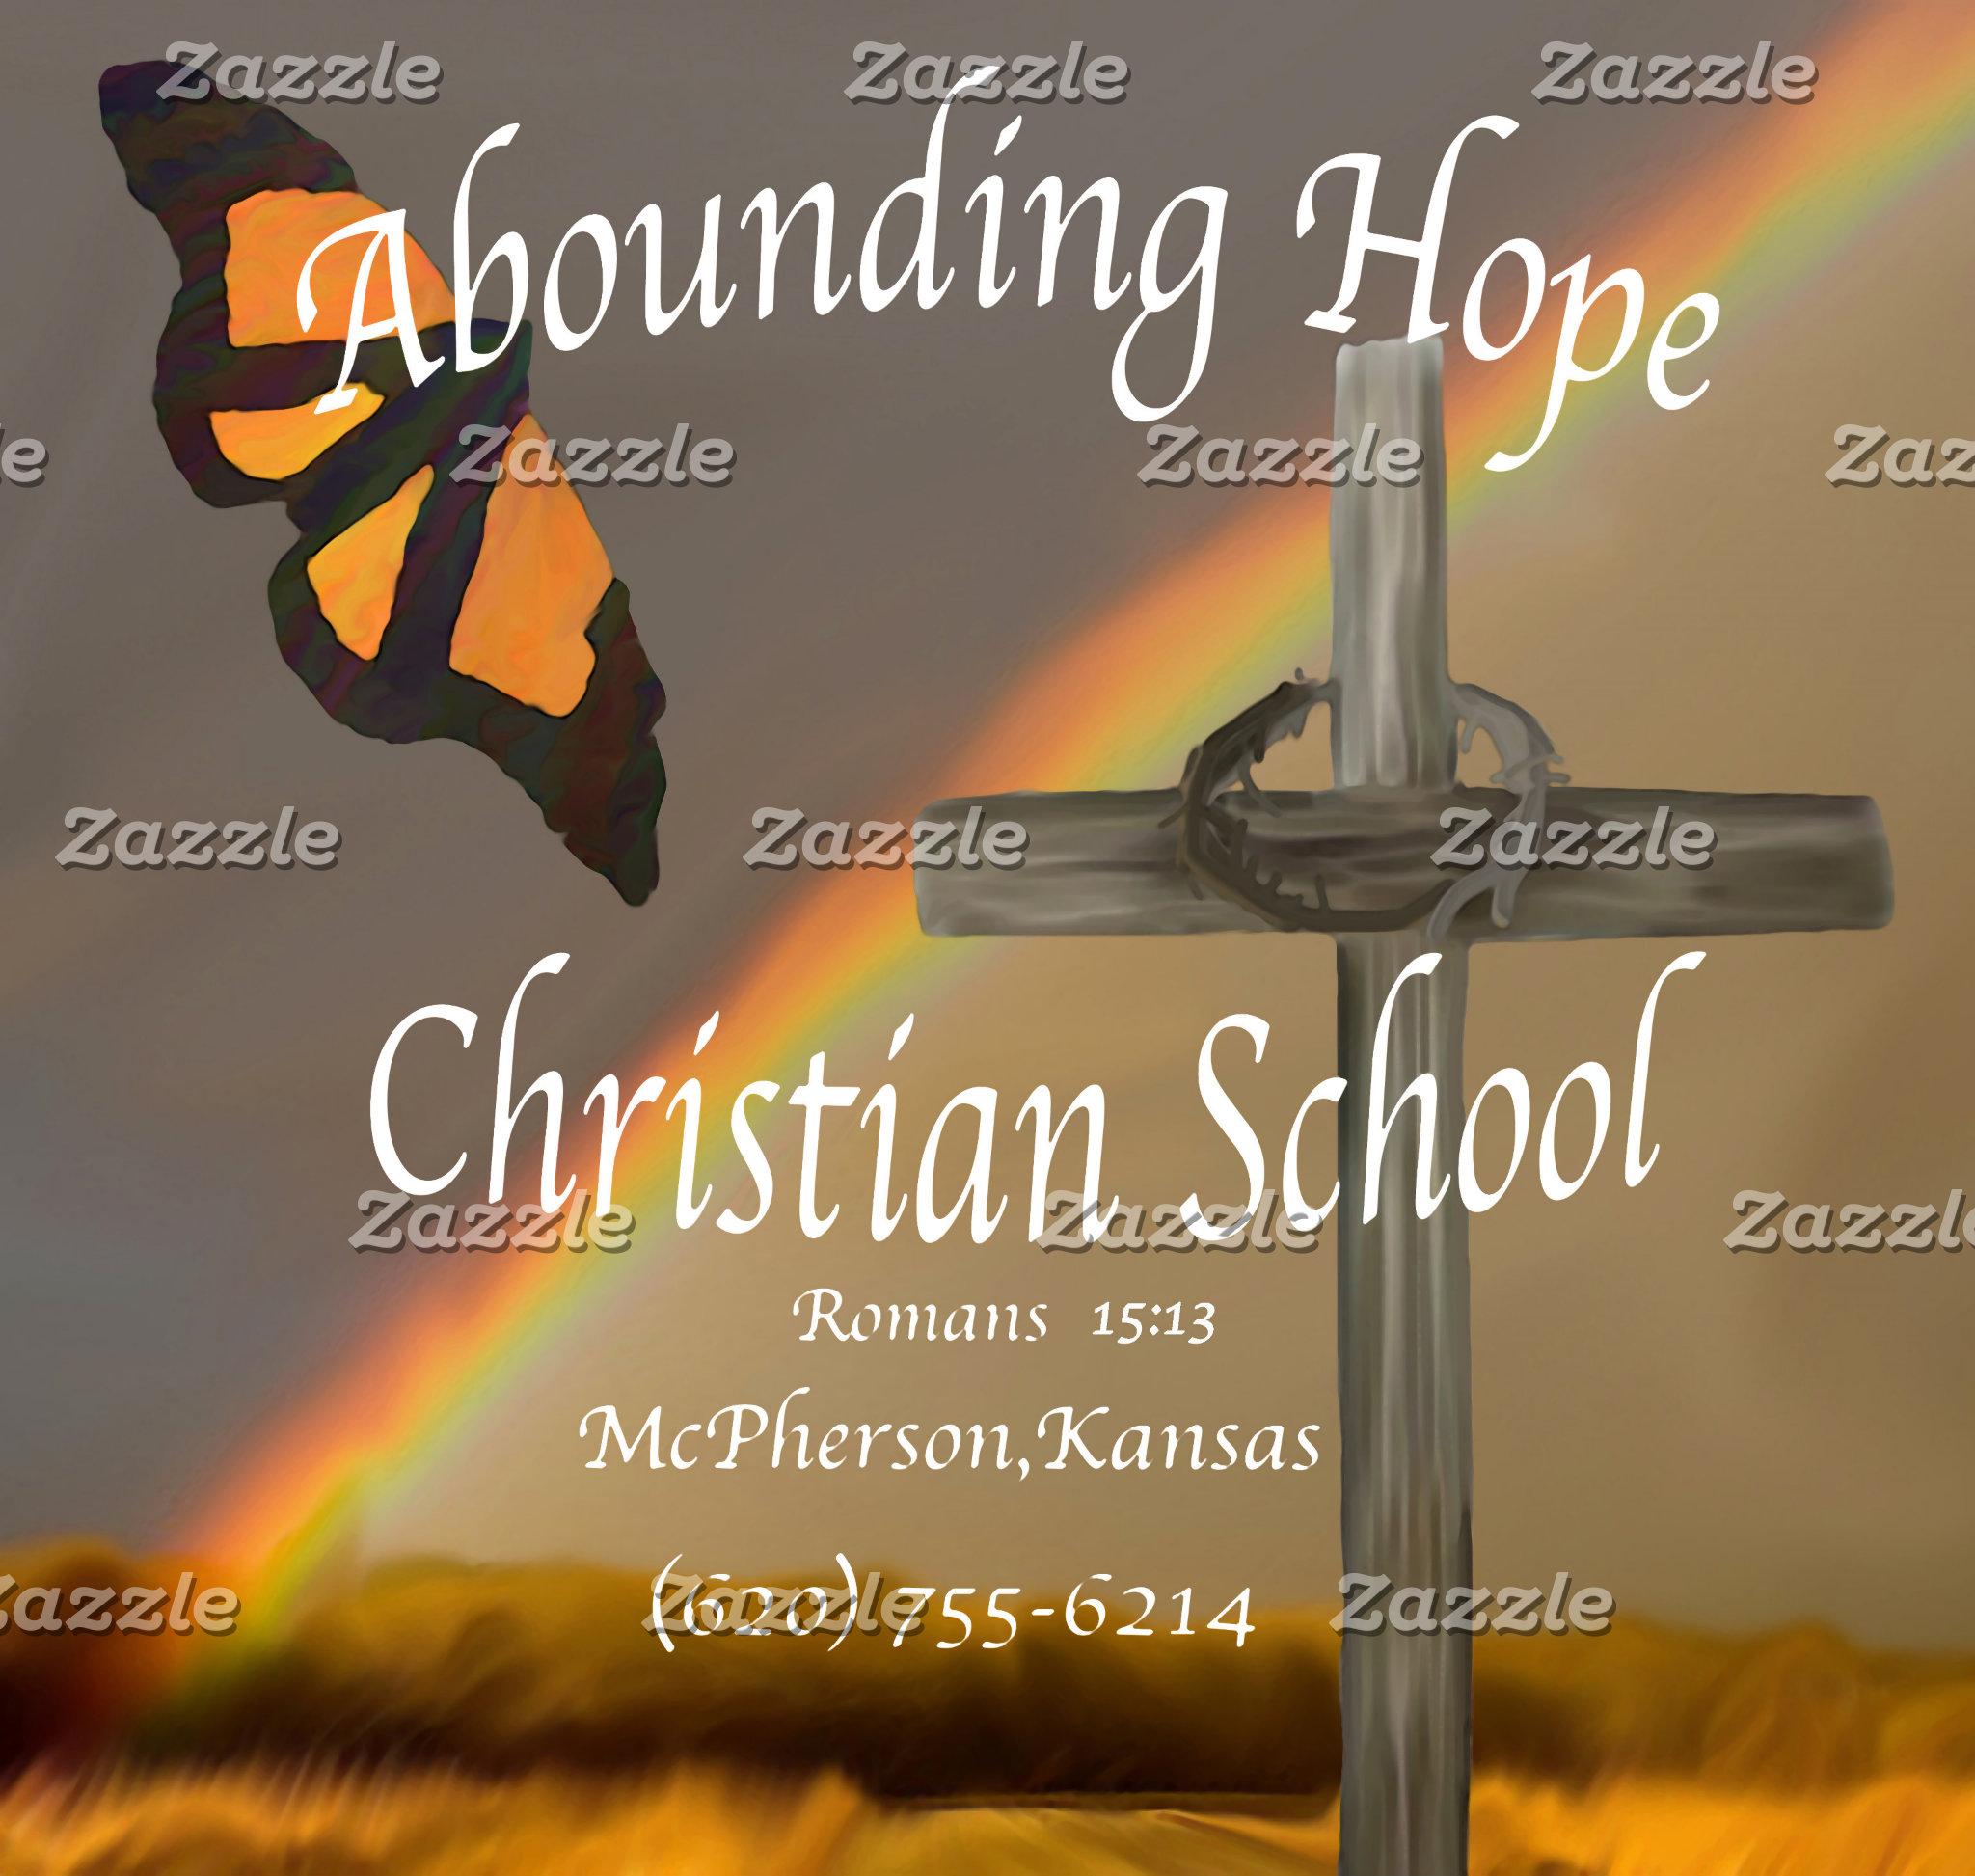 Abounding Hope